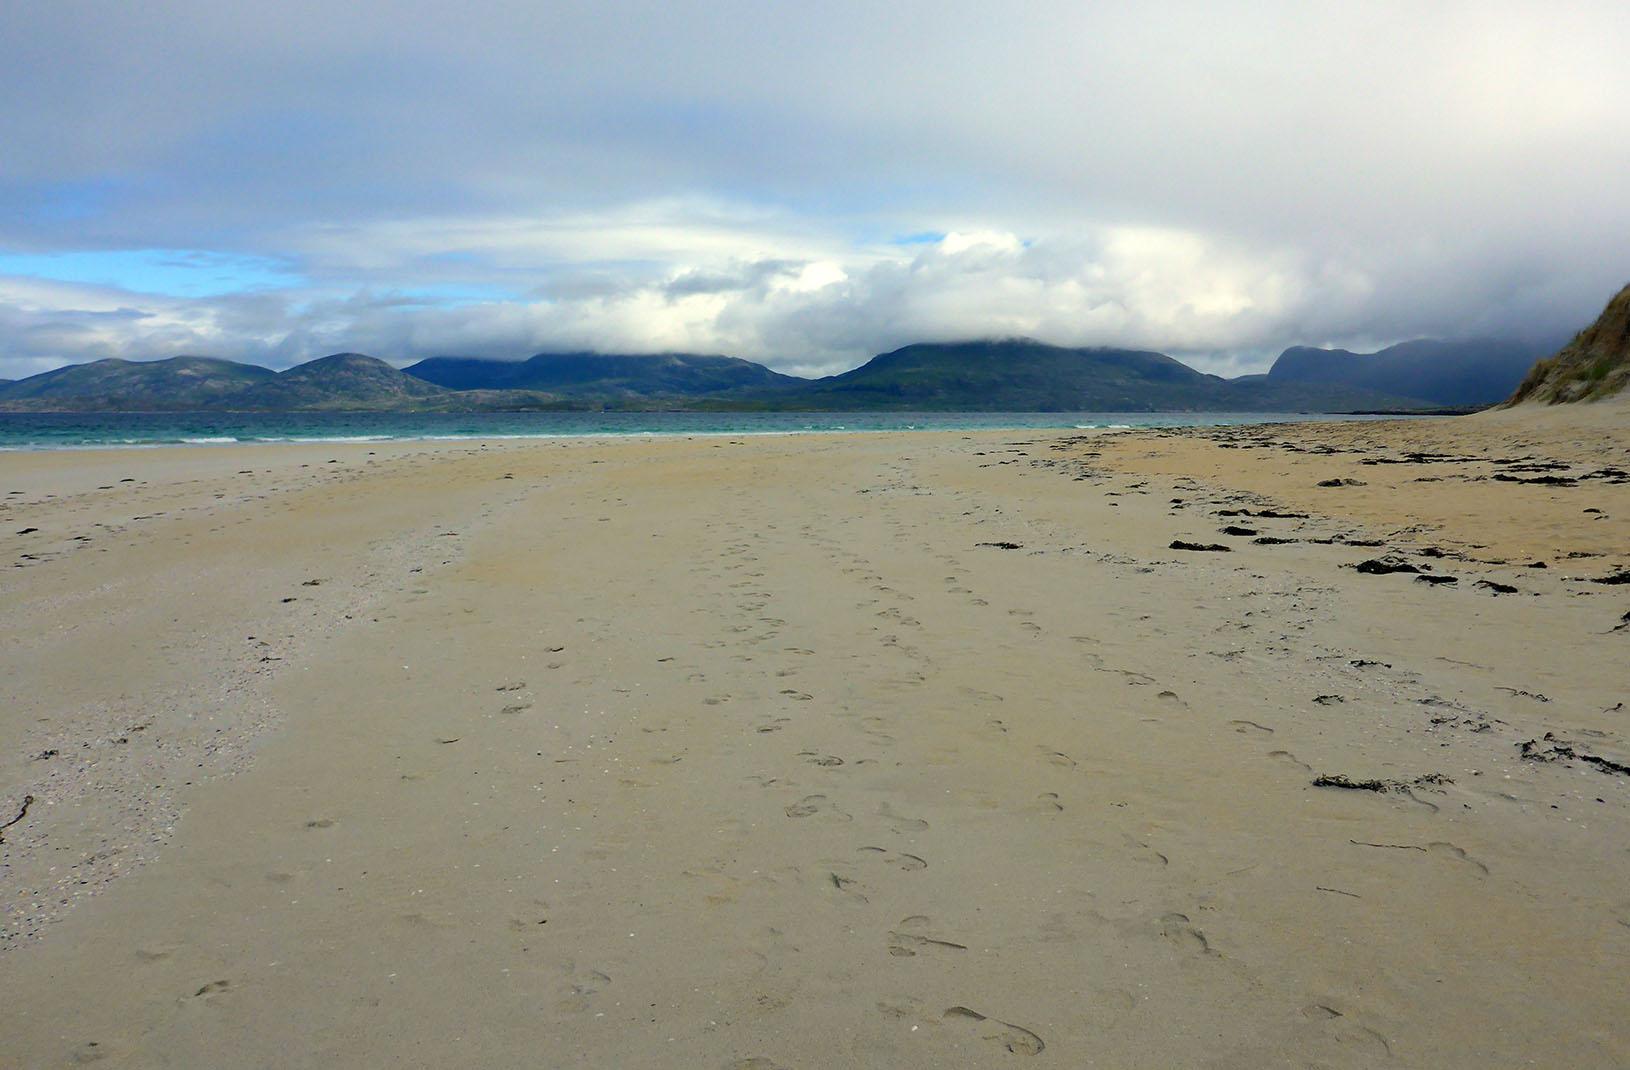 36 Harris hills from Luskentyre beach